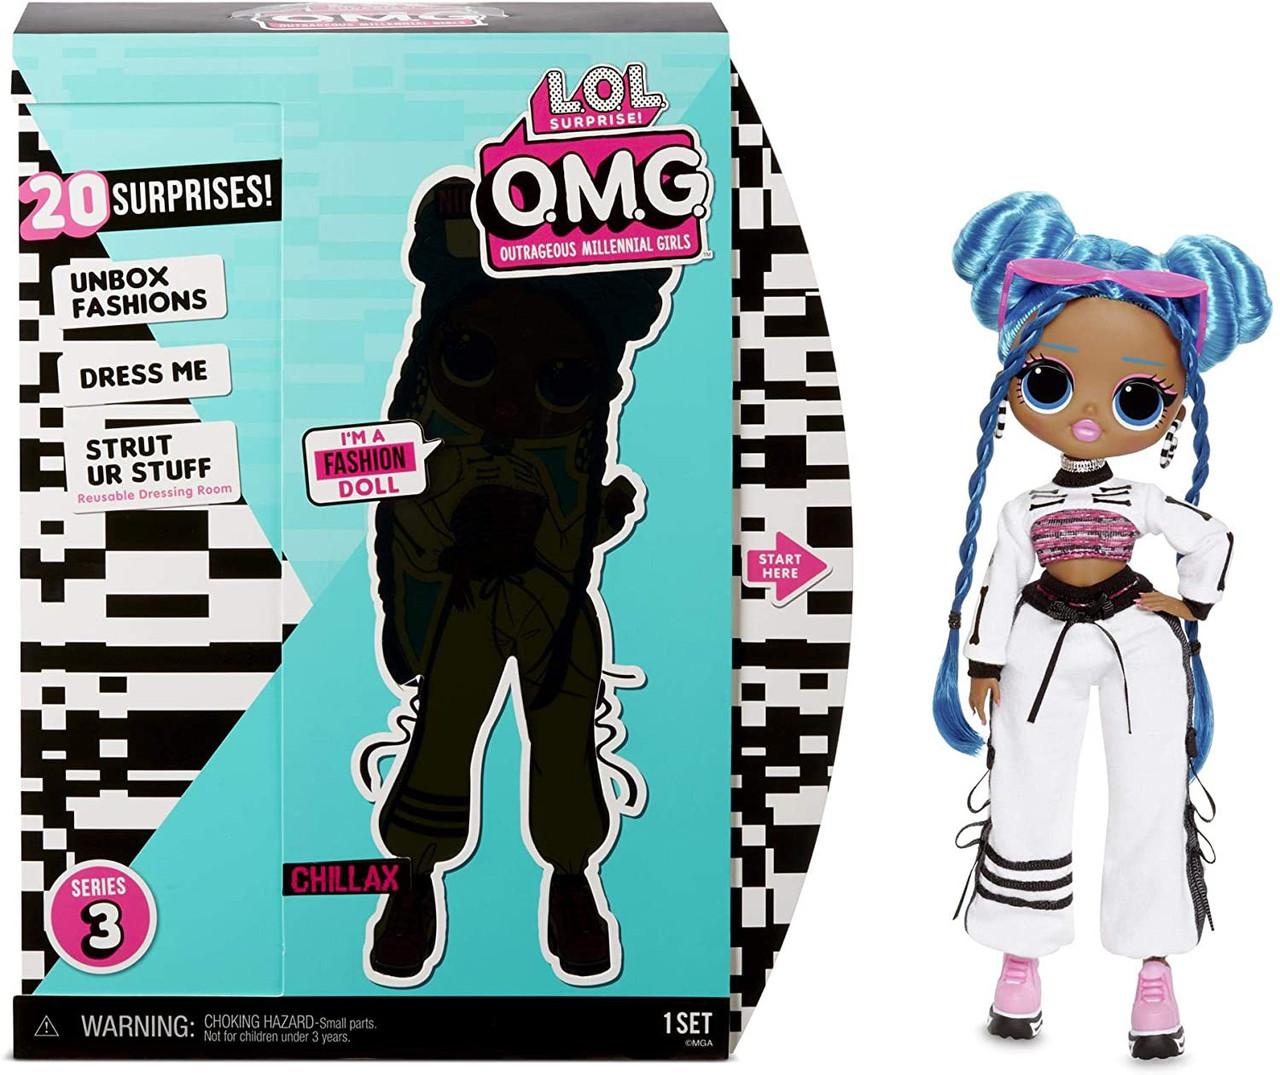 LOL Surprise OMG Series 3 Chillax Fashion Doll MGA ...